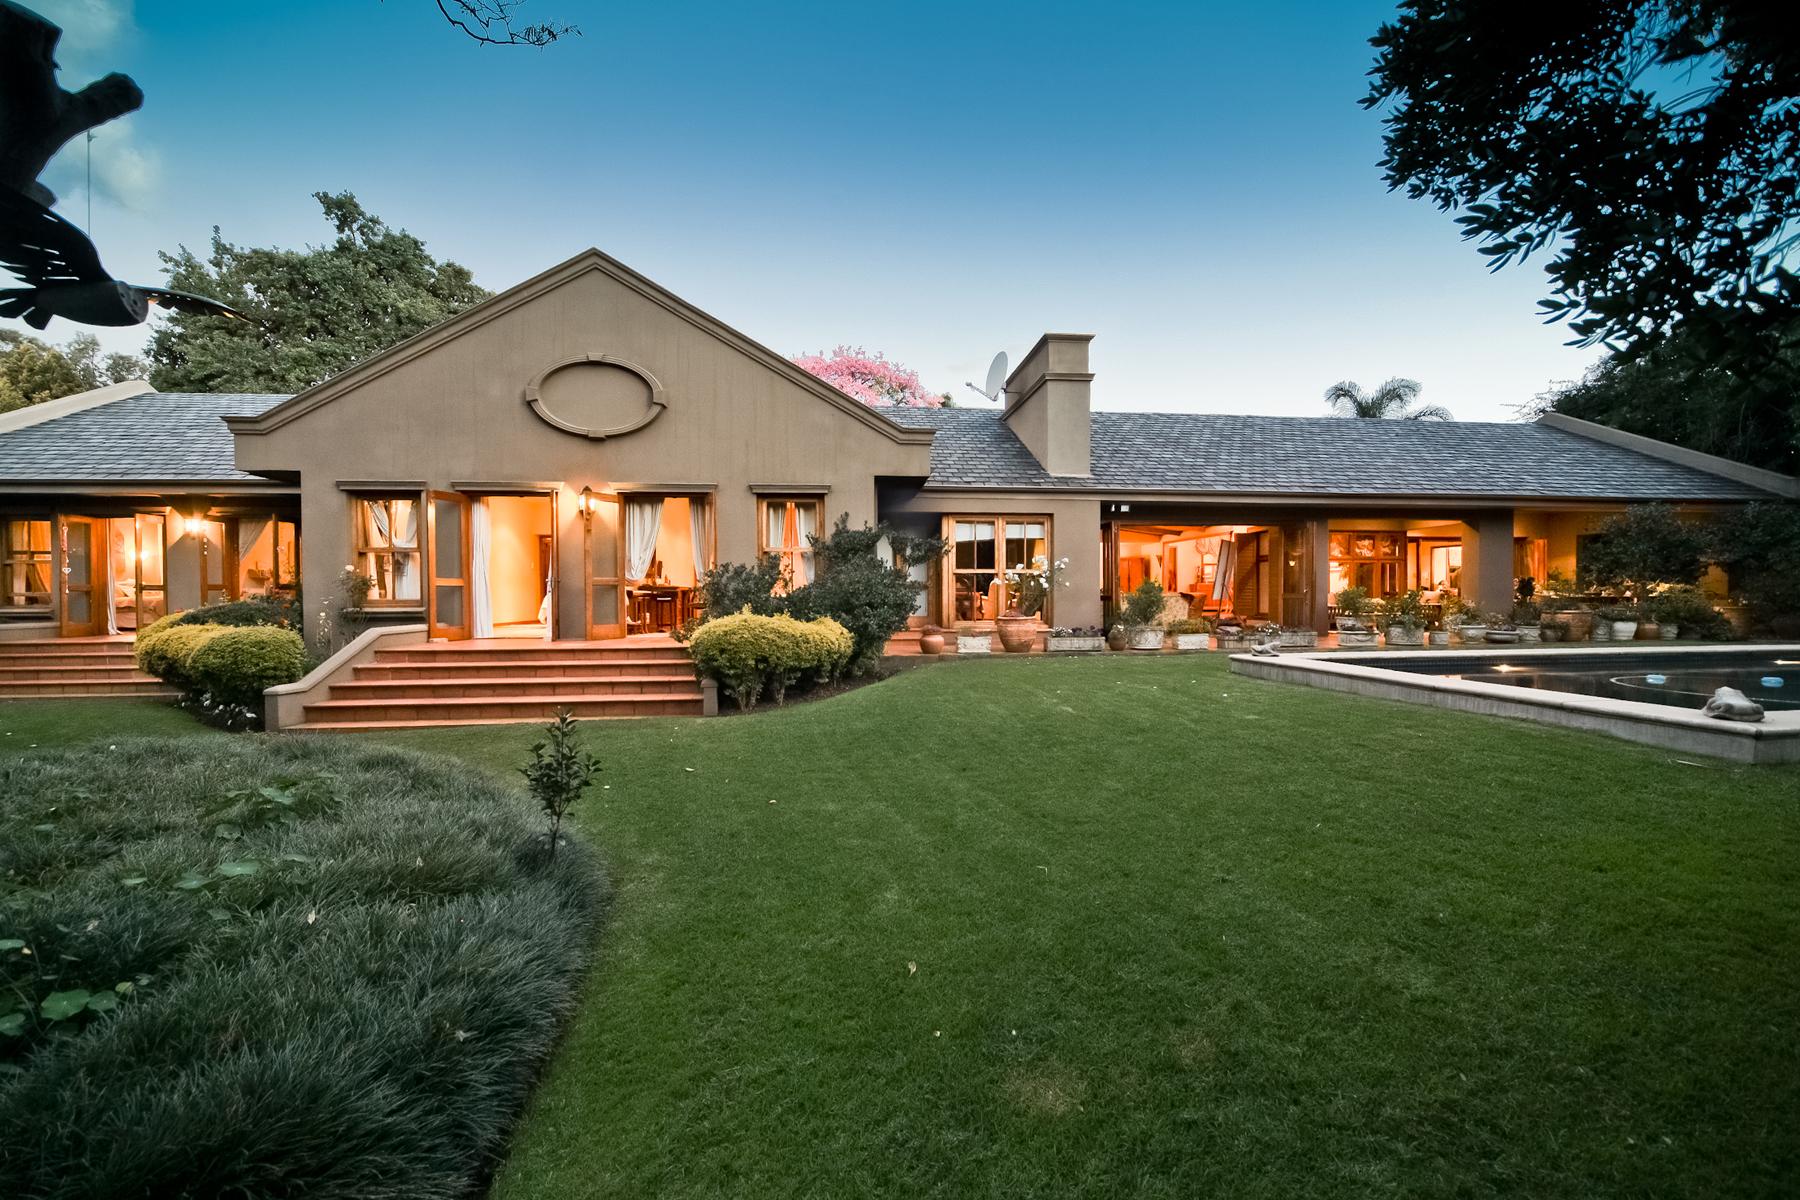 Villa per Vendita alle ore Linksfield North Johannesburg, Gauteng, 2007 Sudafrica